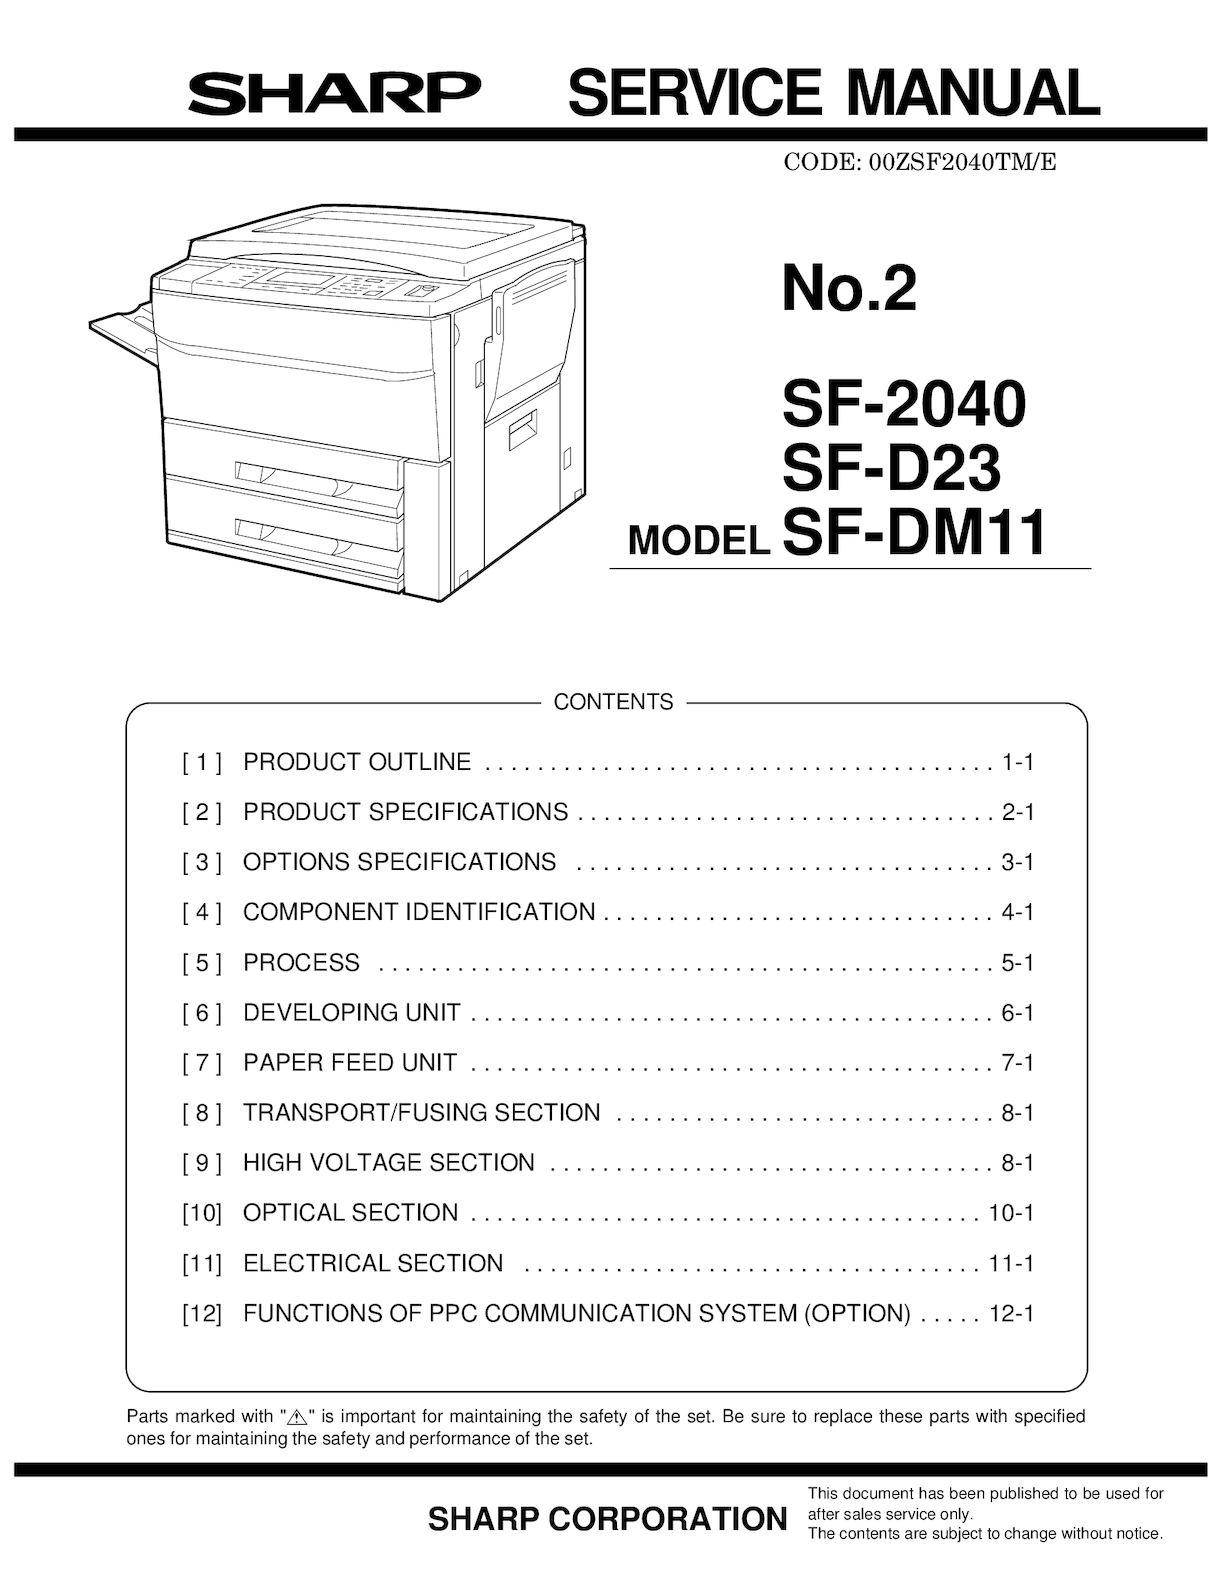 Calaméo - Service Manual Sharp SF 2040 SM